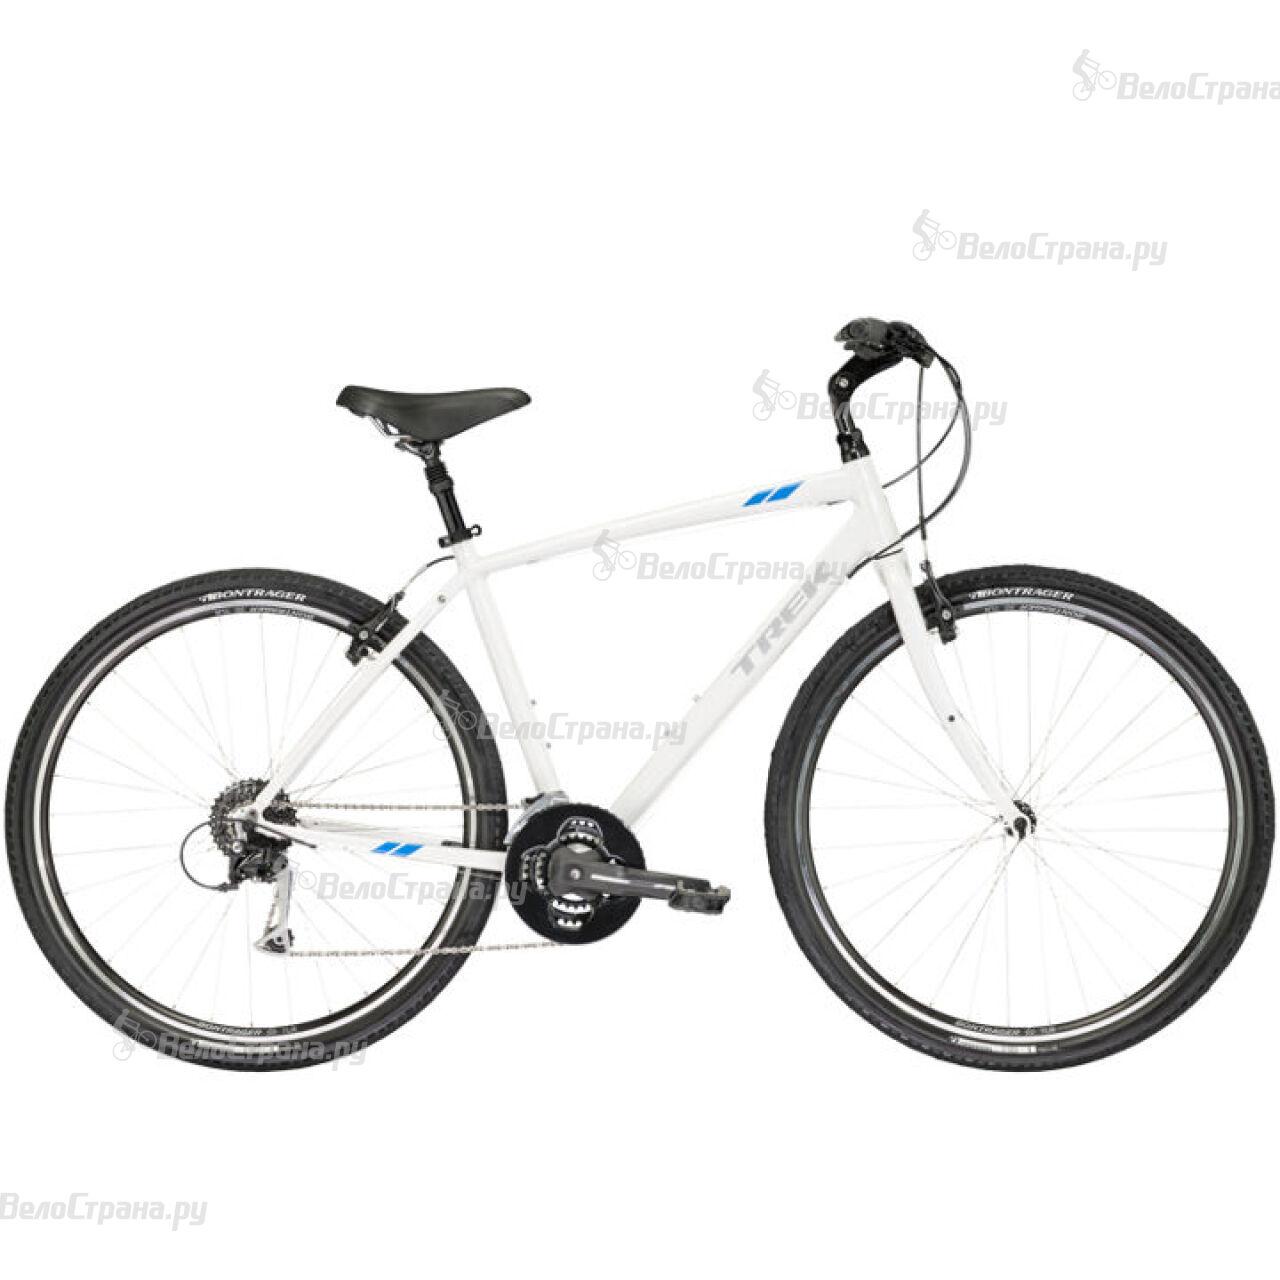 Велосипед Trek Verve 3 (2017) велосипед trek verve 2 2014